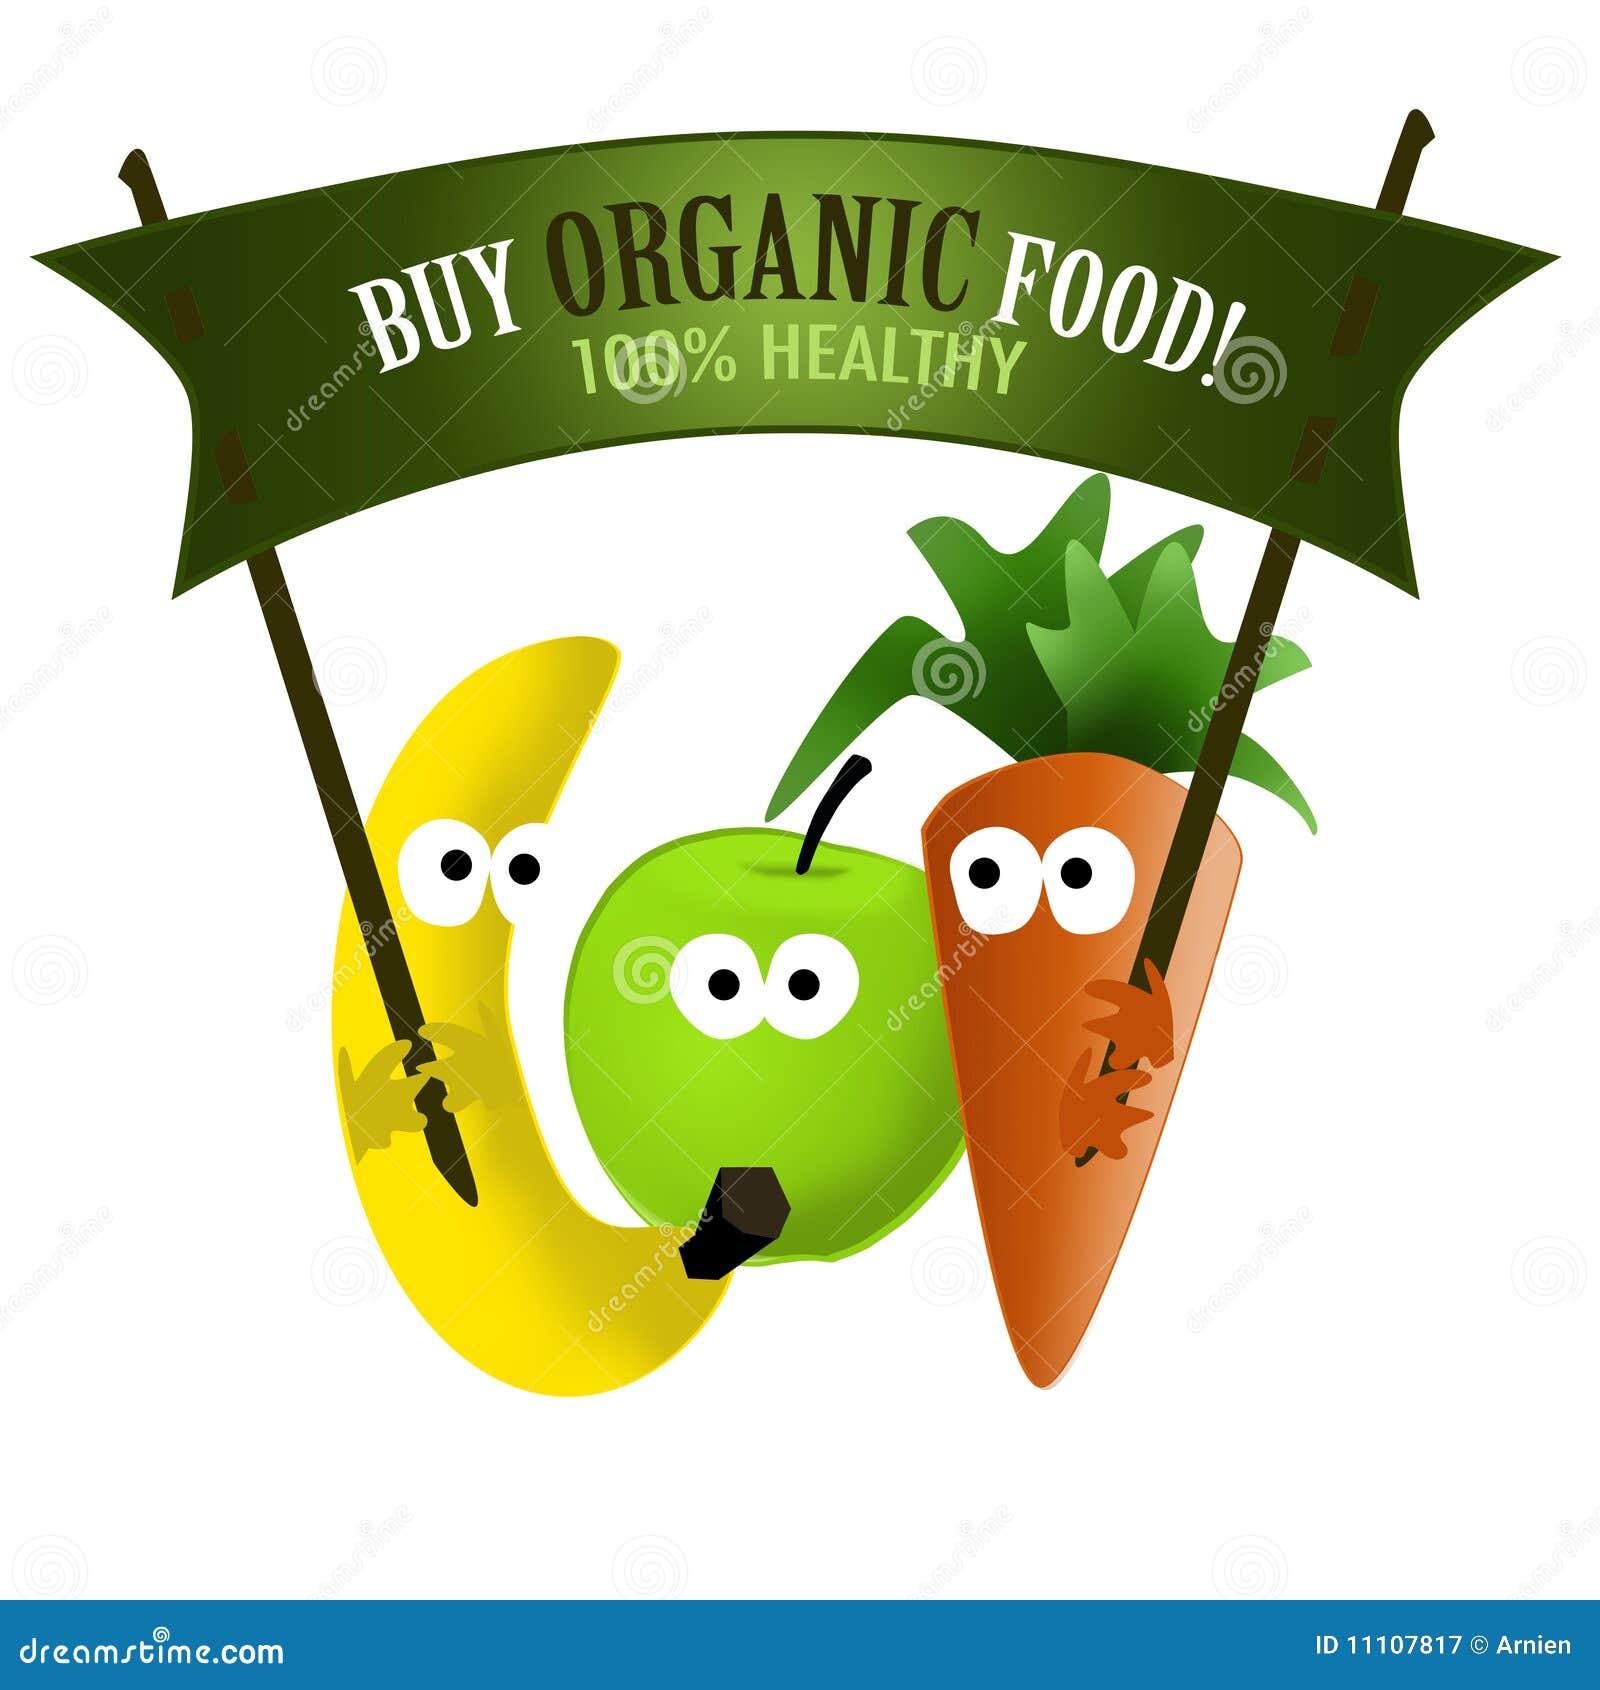 Organic Food Products Healthy: Organic Food Healthy Stock Illustration. Illustration Of